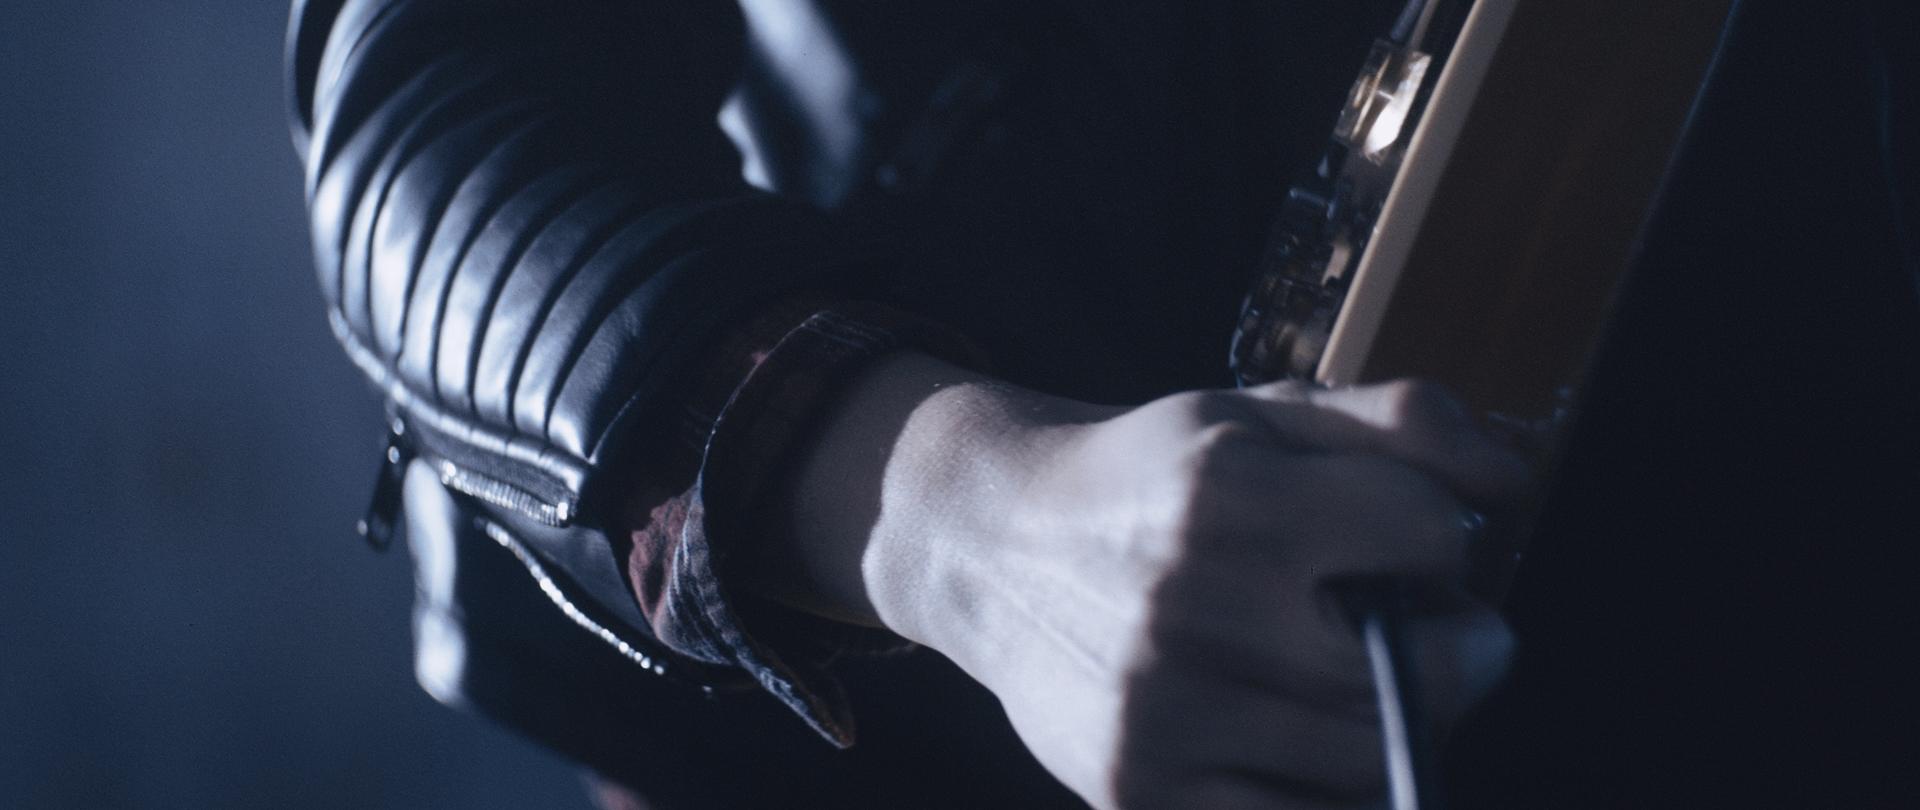 MGP_Jacob_musikvideo_FINAL_MASTER_26102015_549.jpg